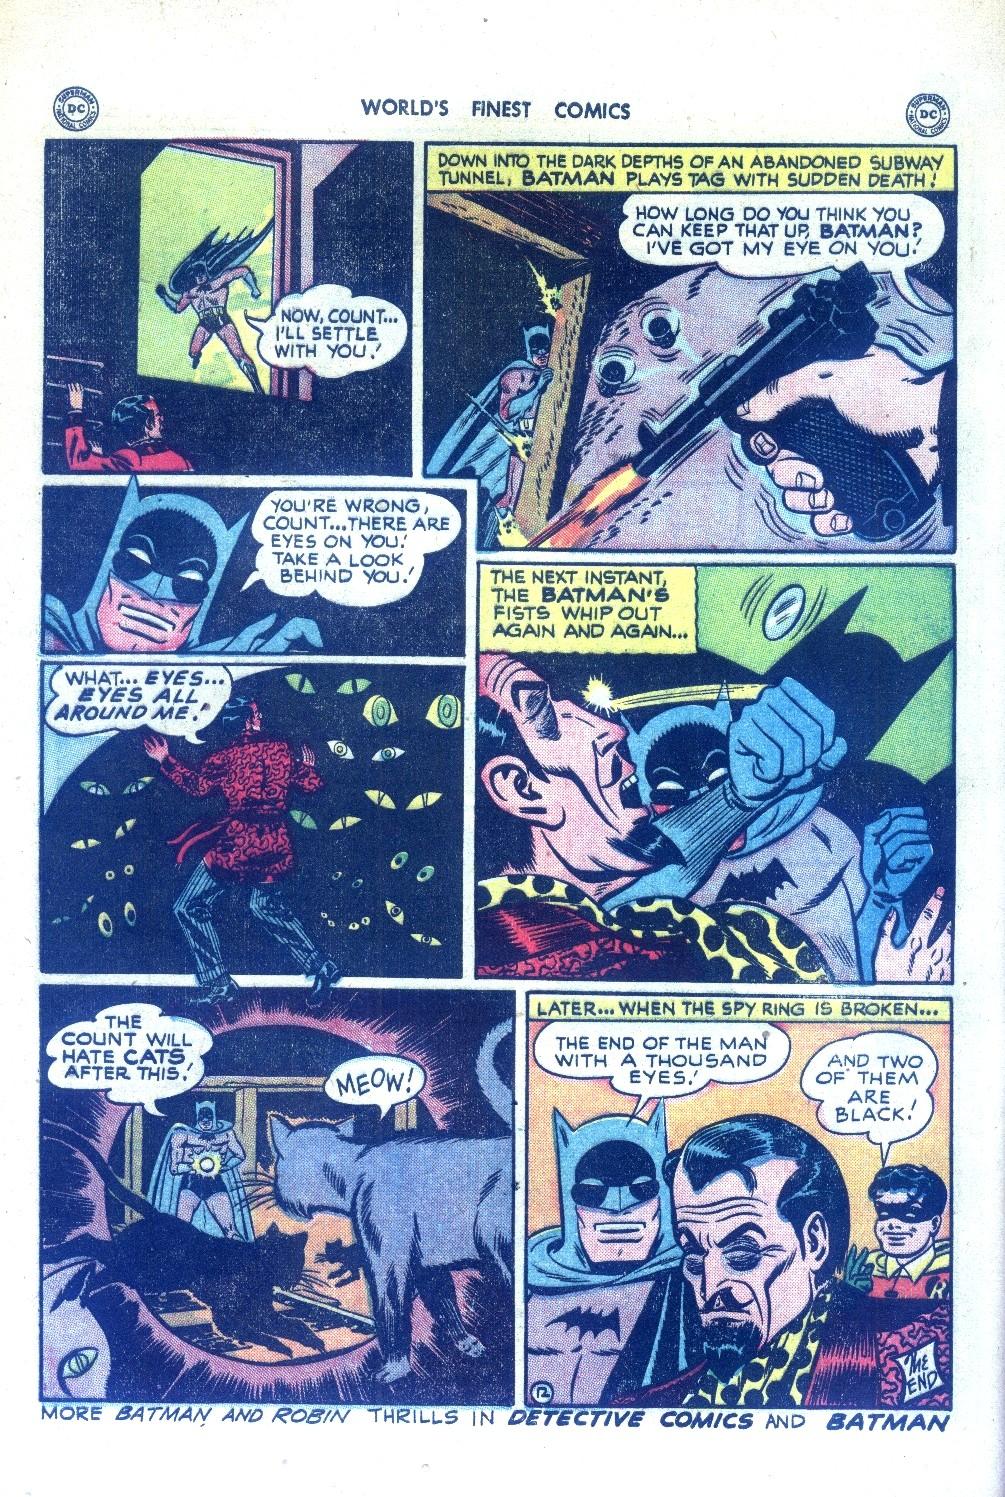 Read online World's Finest Comics comic -  Issue #43 - 72